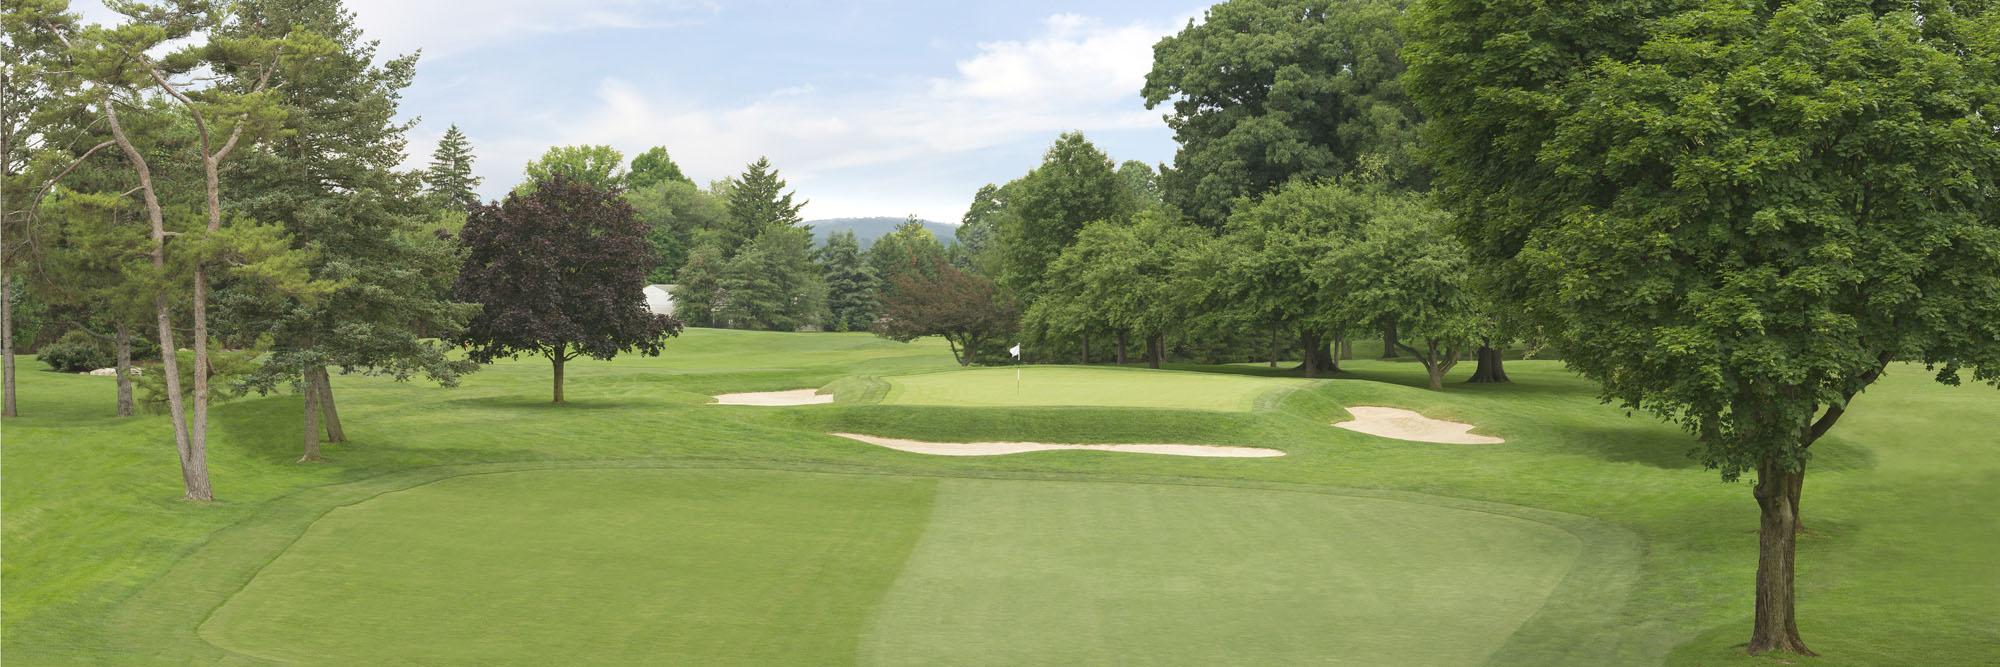 Golf Course Image - Berkshire No. 16